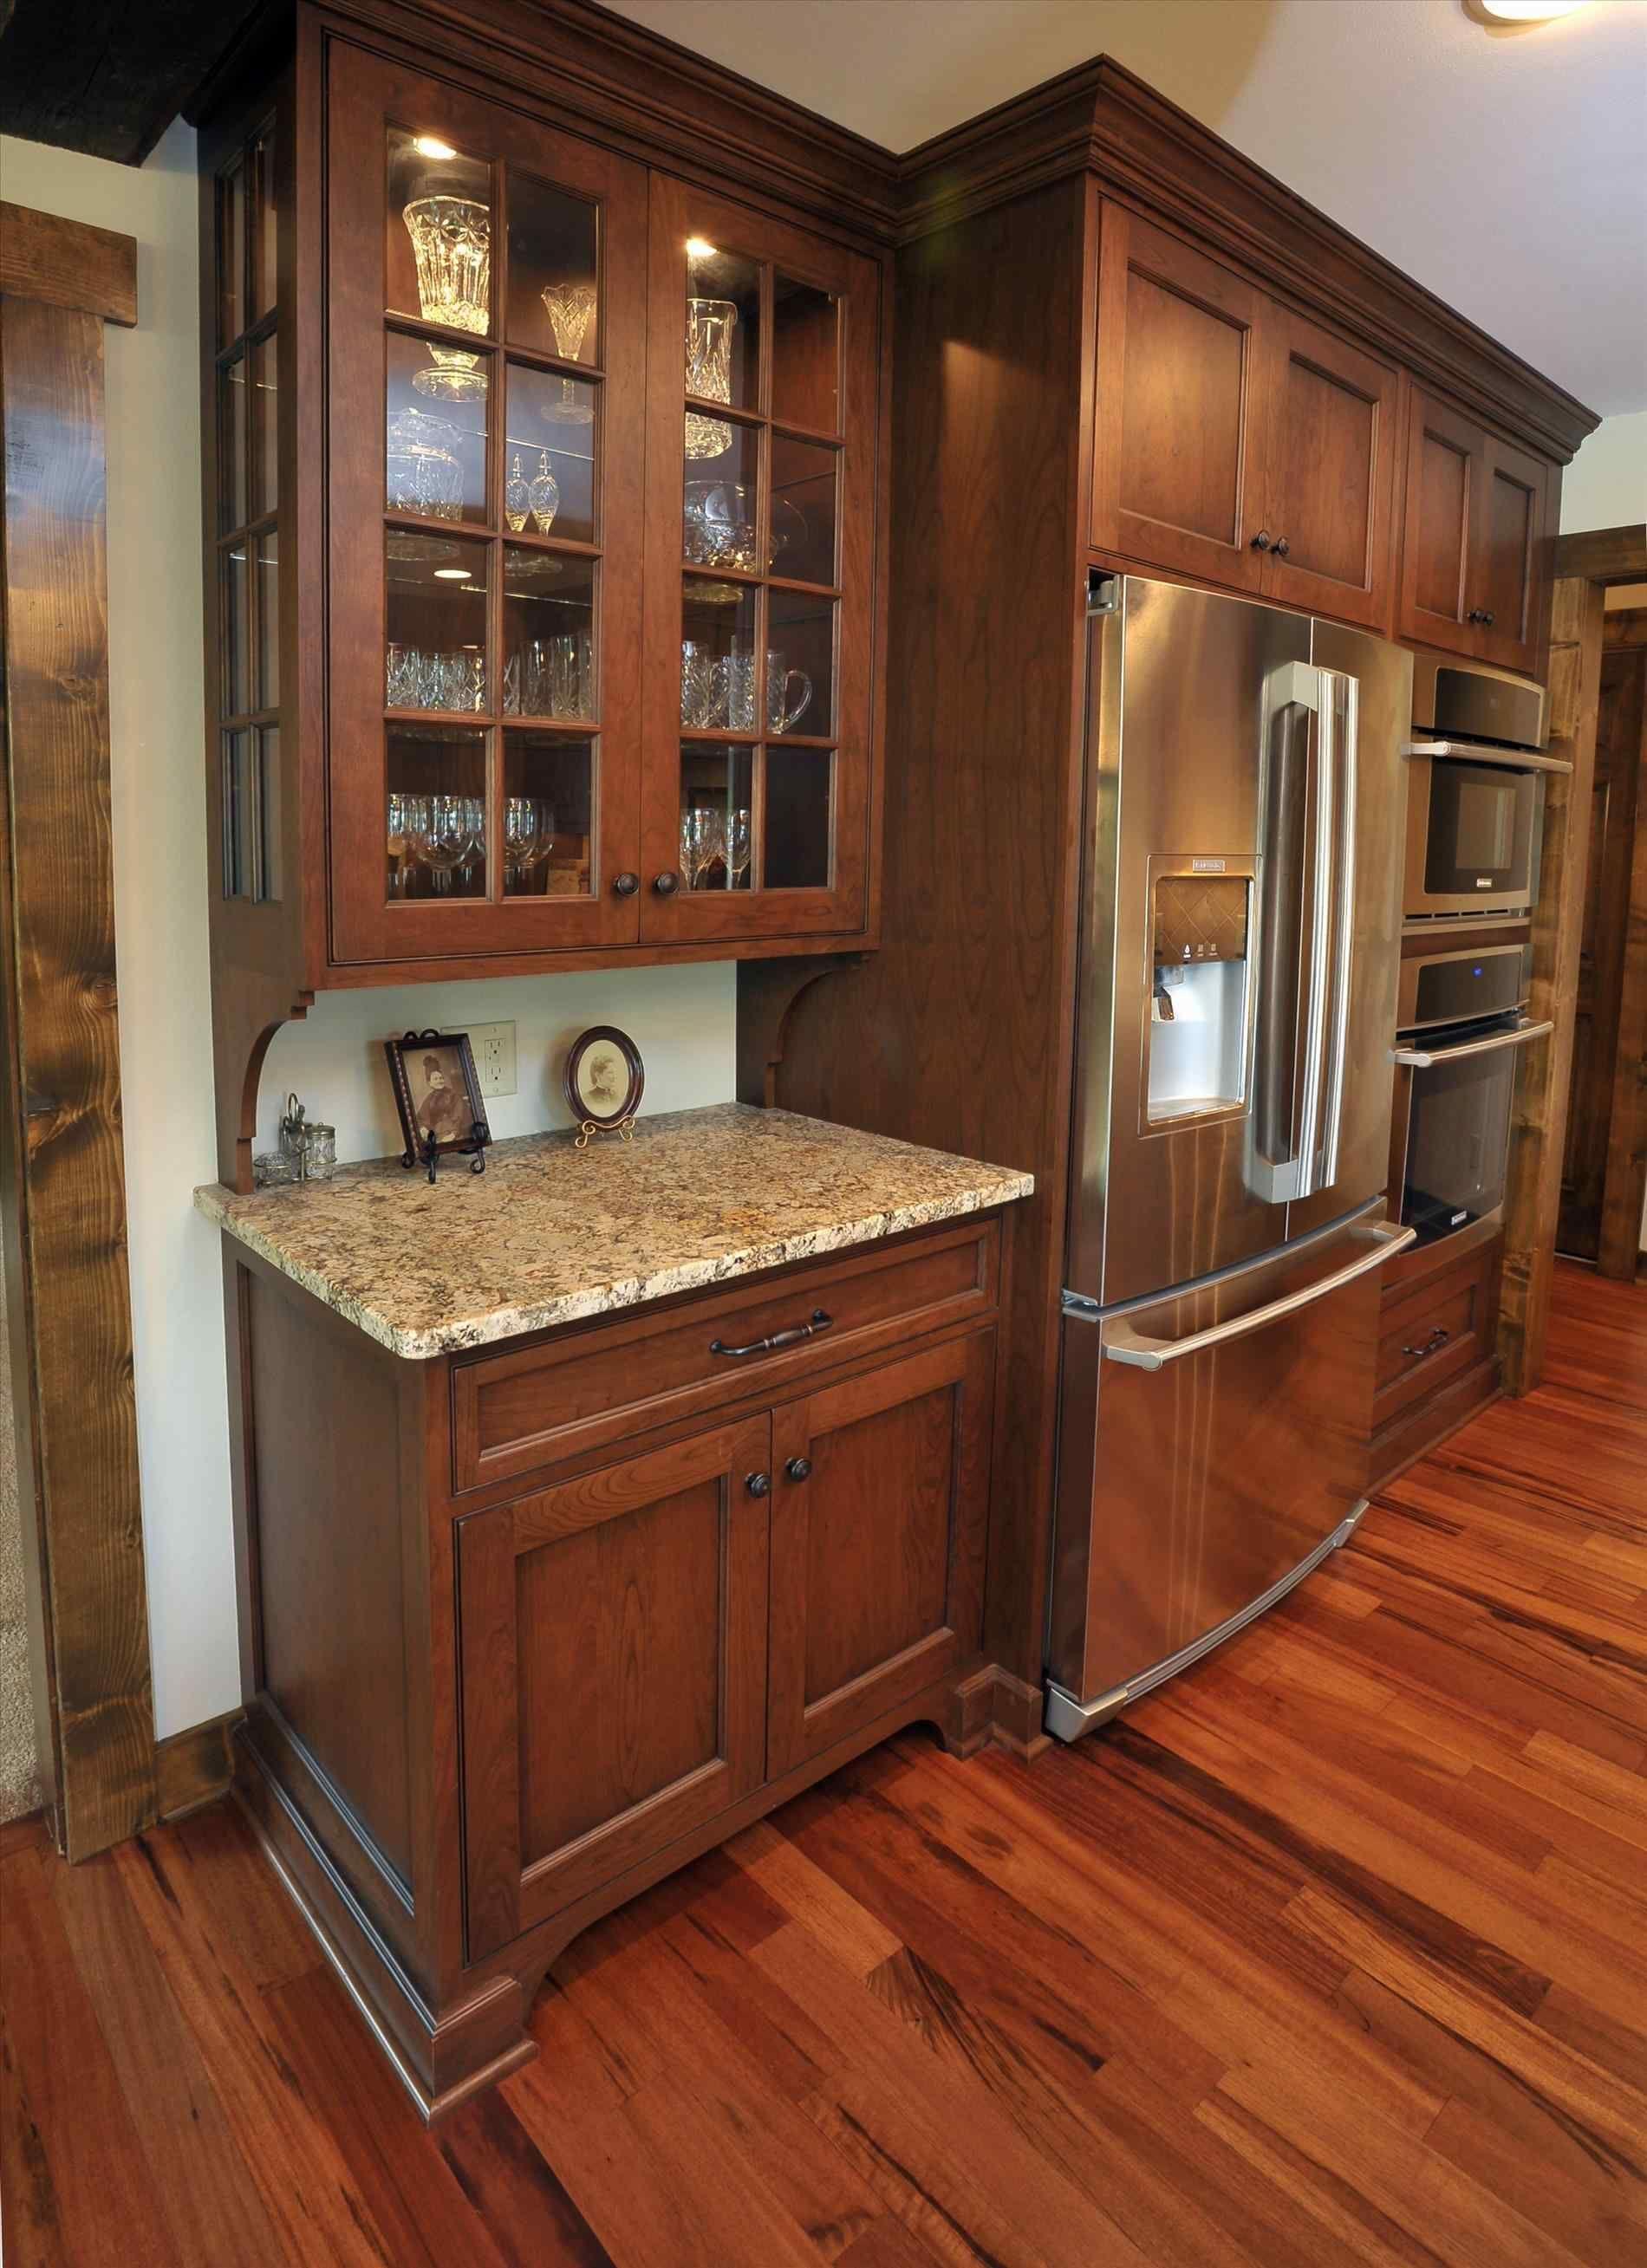 Best Tudor Kitchen Remodel Ideas To Inspire You Kitchen Room - Tudor kitchen remodel